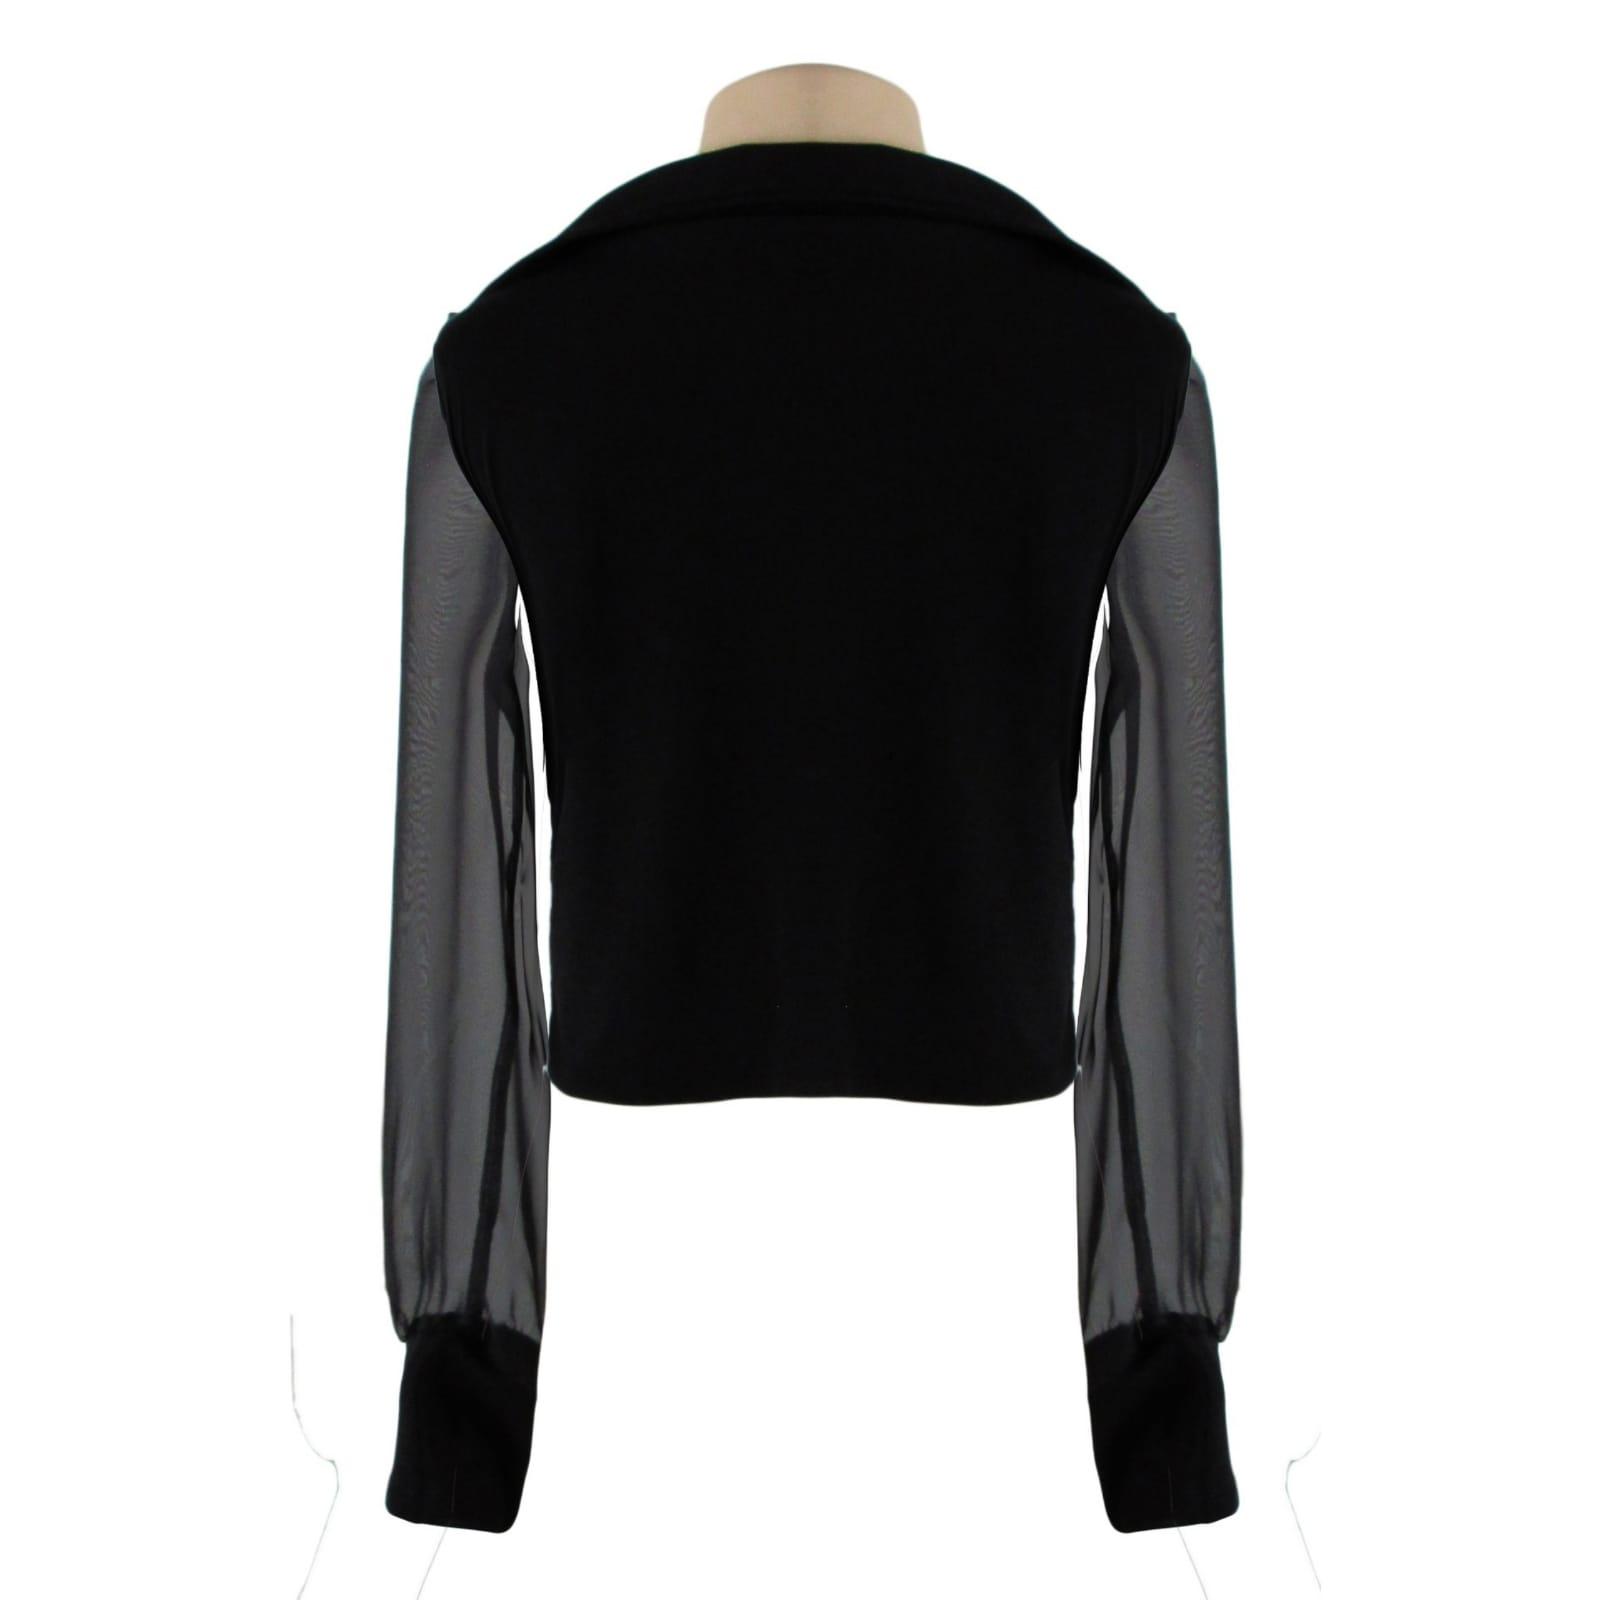 Smart casual v neck black crop top 3 smart casual v neck, black crop top with a back collar, sheer long sleeves. Black cuff